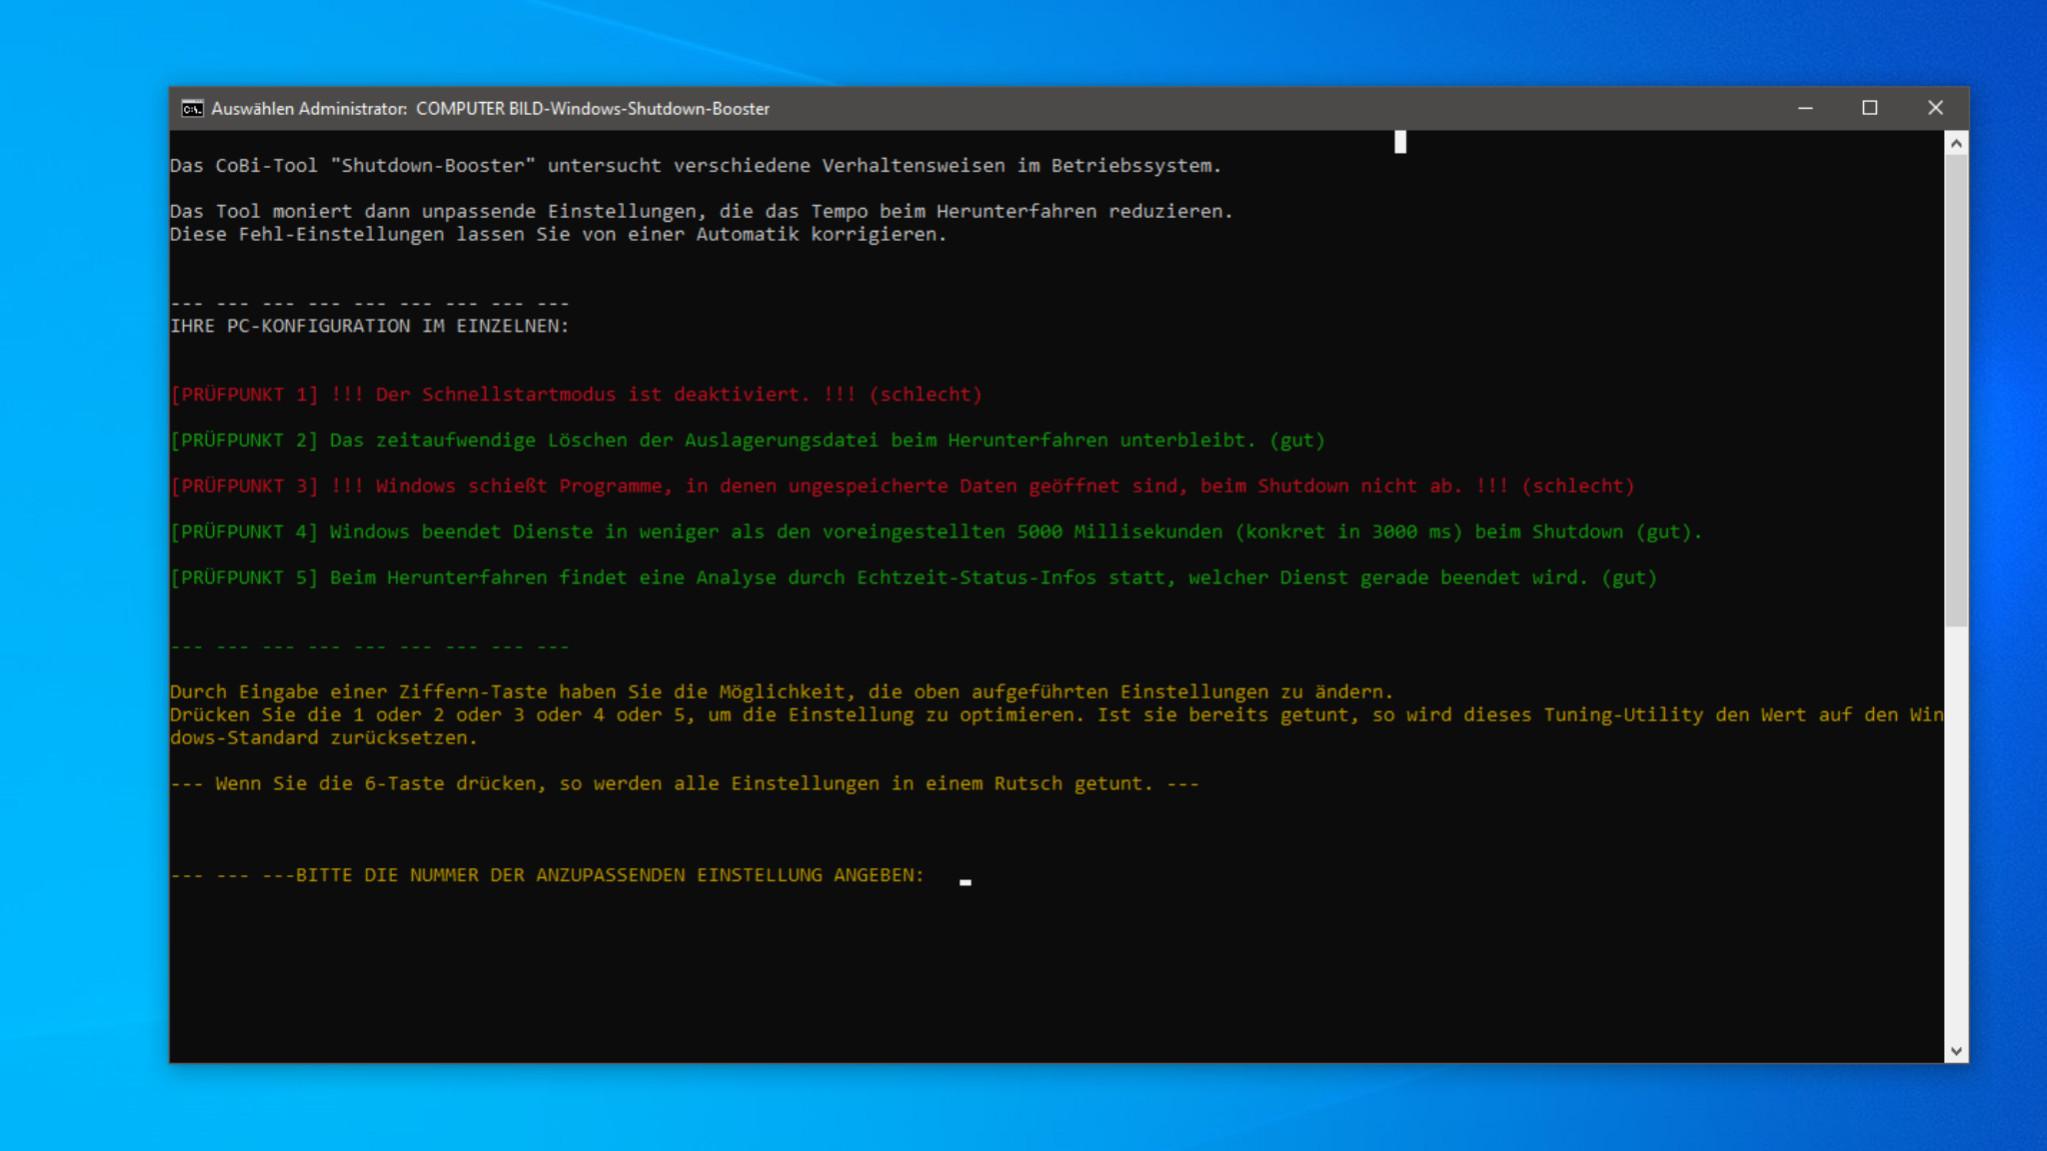 Screenshot 1 - COMPUTER BILD-Windows-Shutdown-Booster